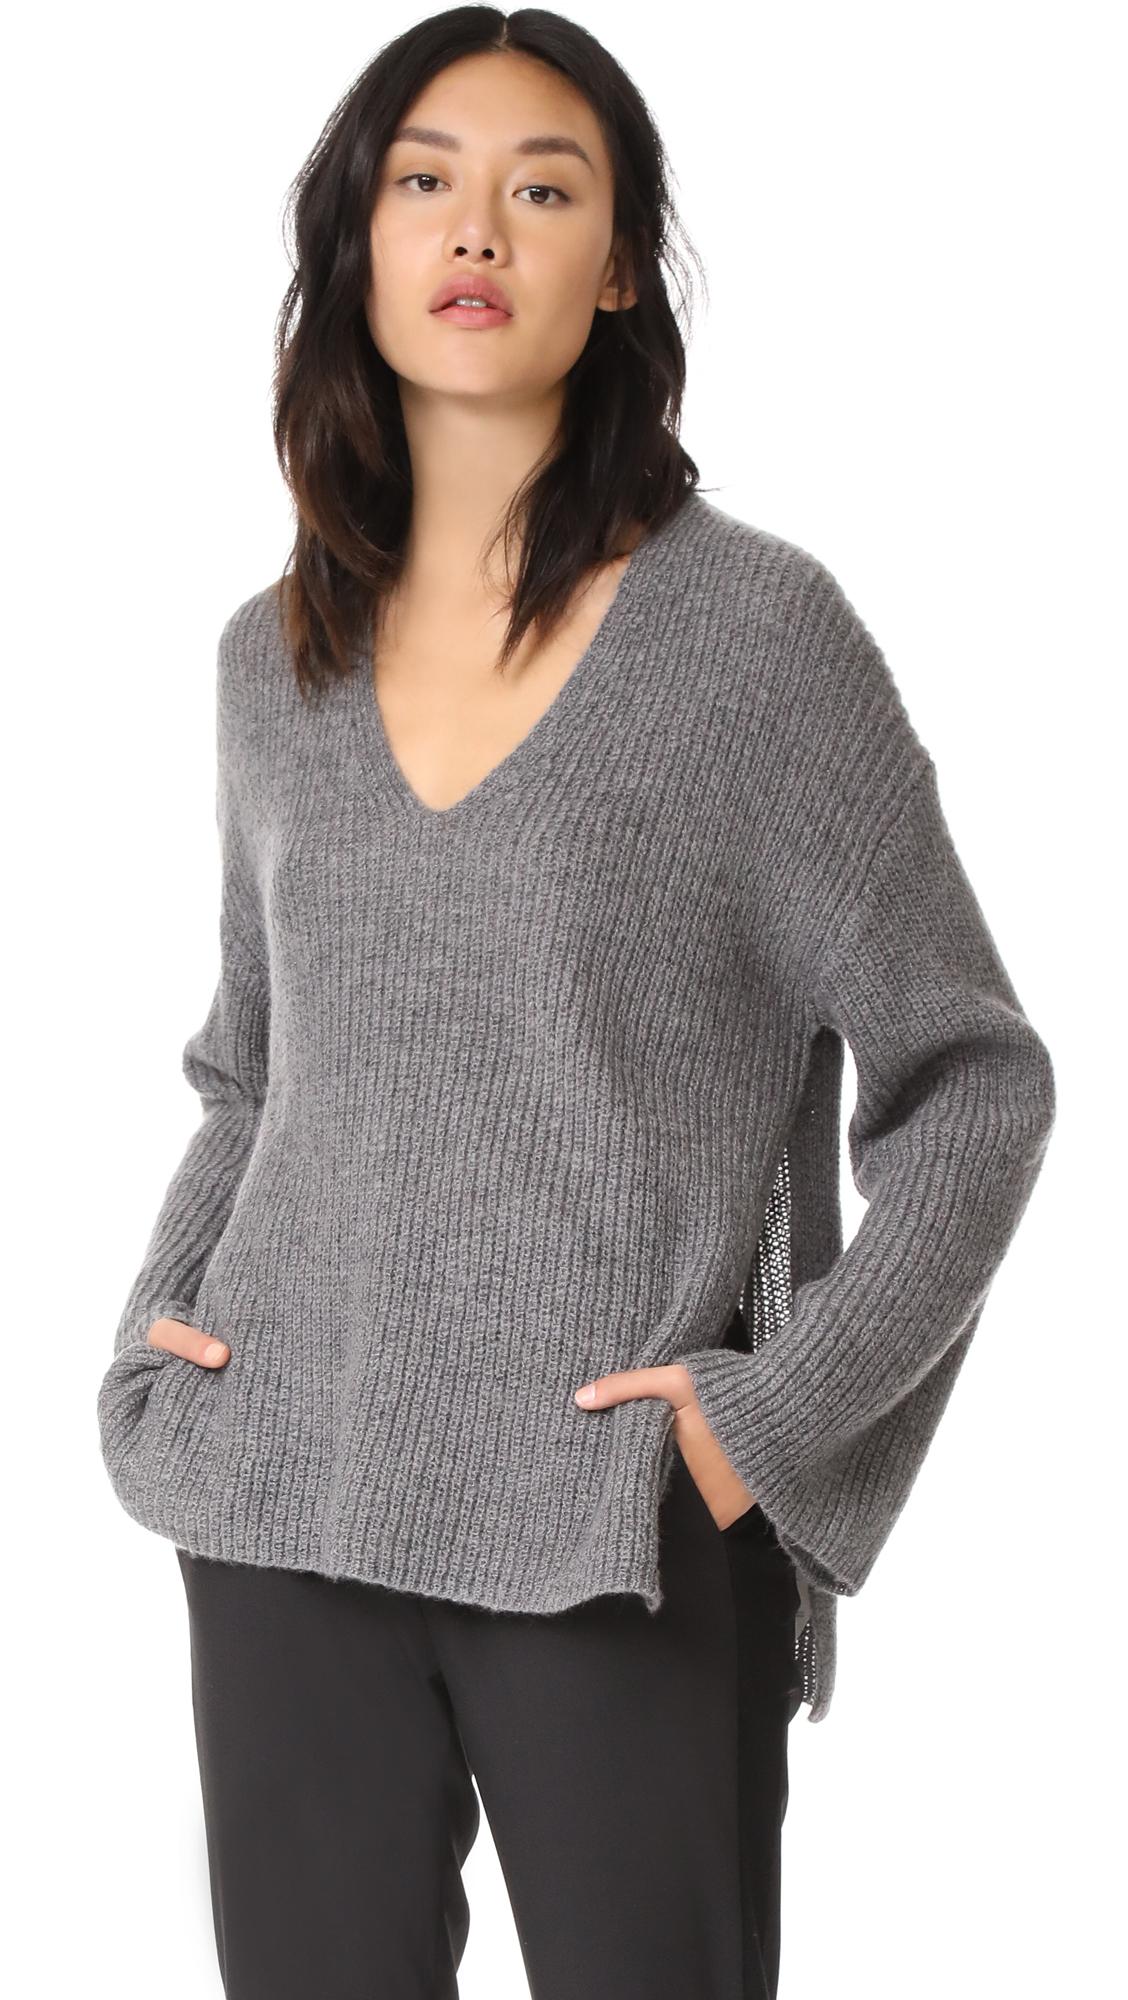 Rebecca Minkoff Remi Sweater - Dark Heather